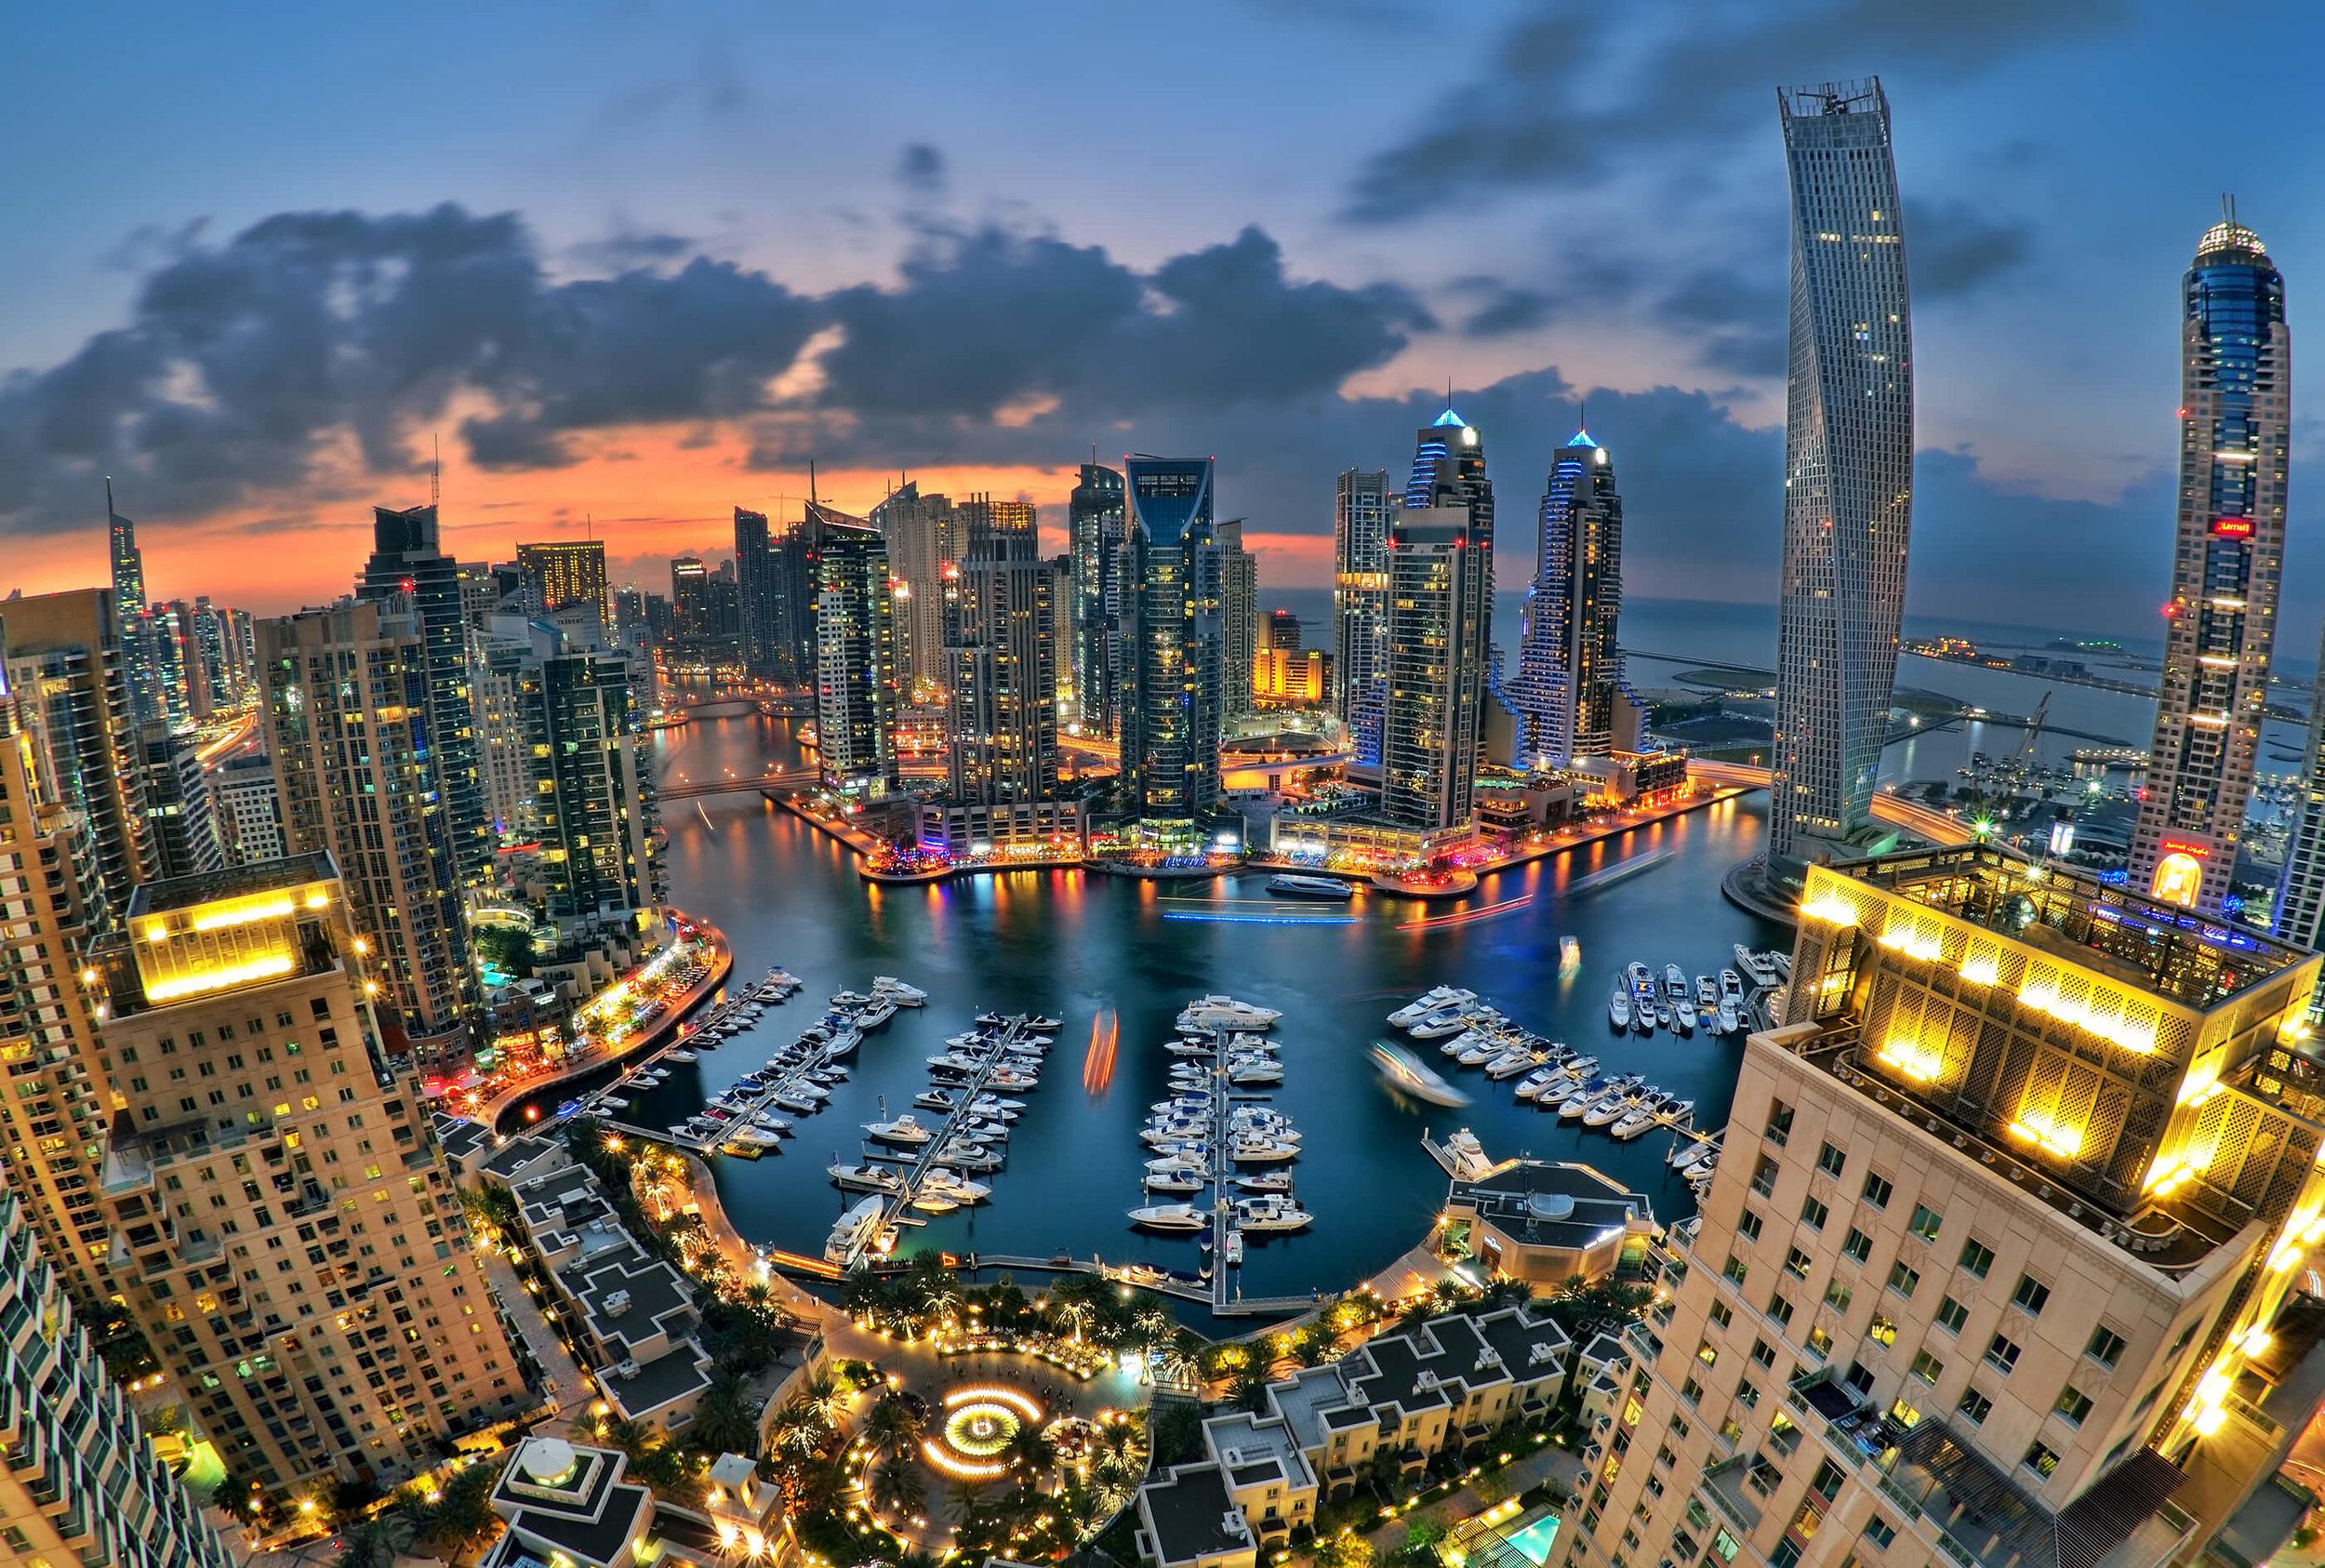 bigstock-Dubai-Marina-New-Dubai-62452307-2.jpg